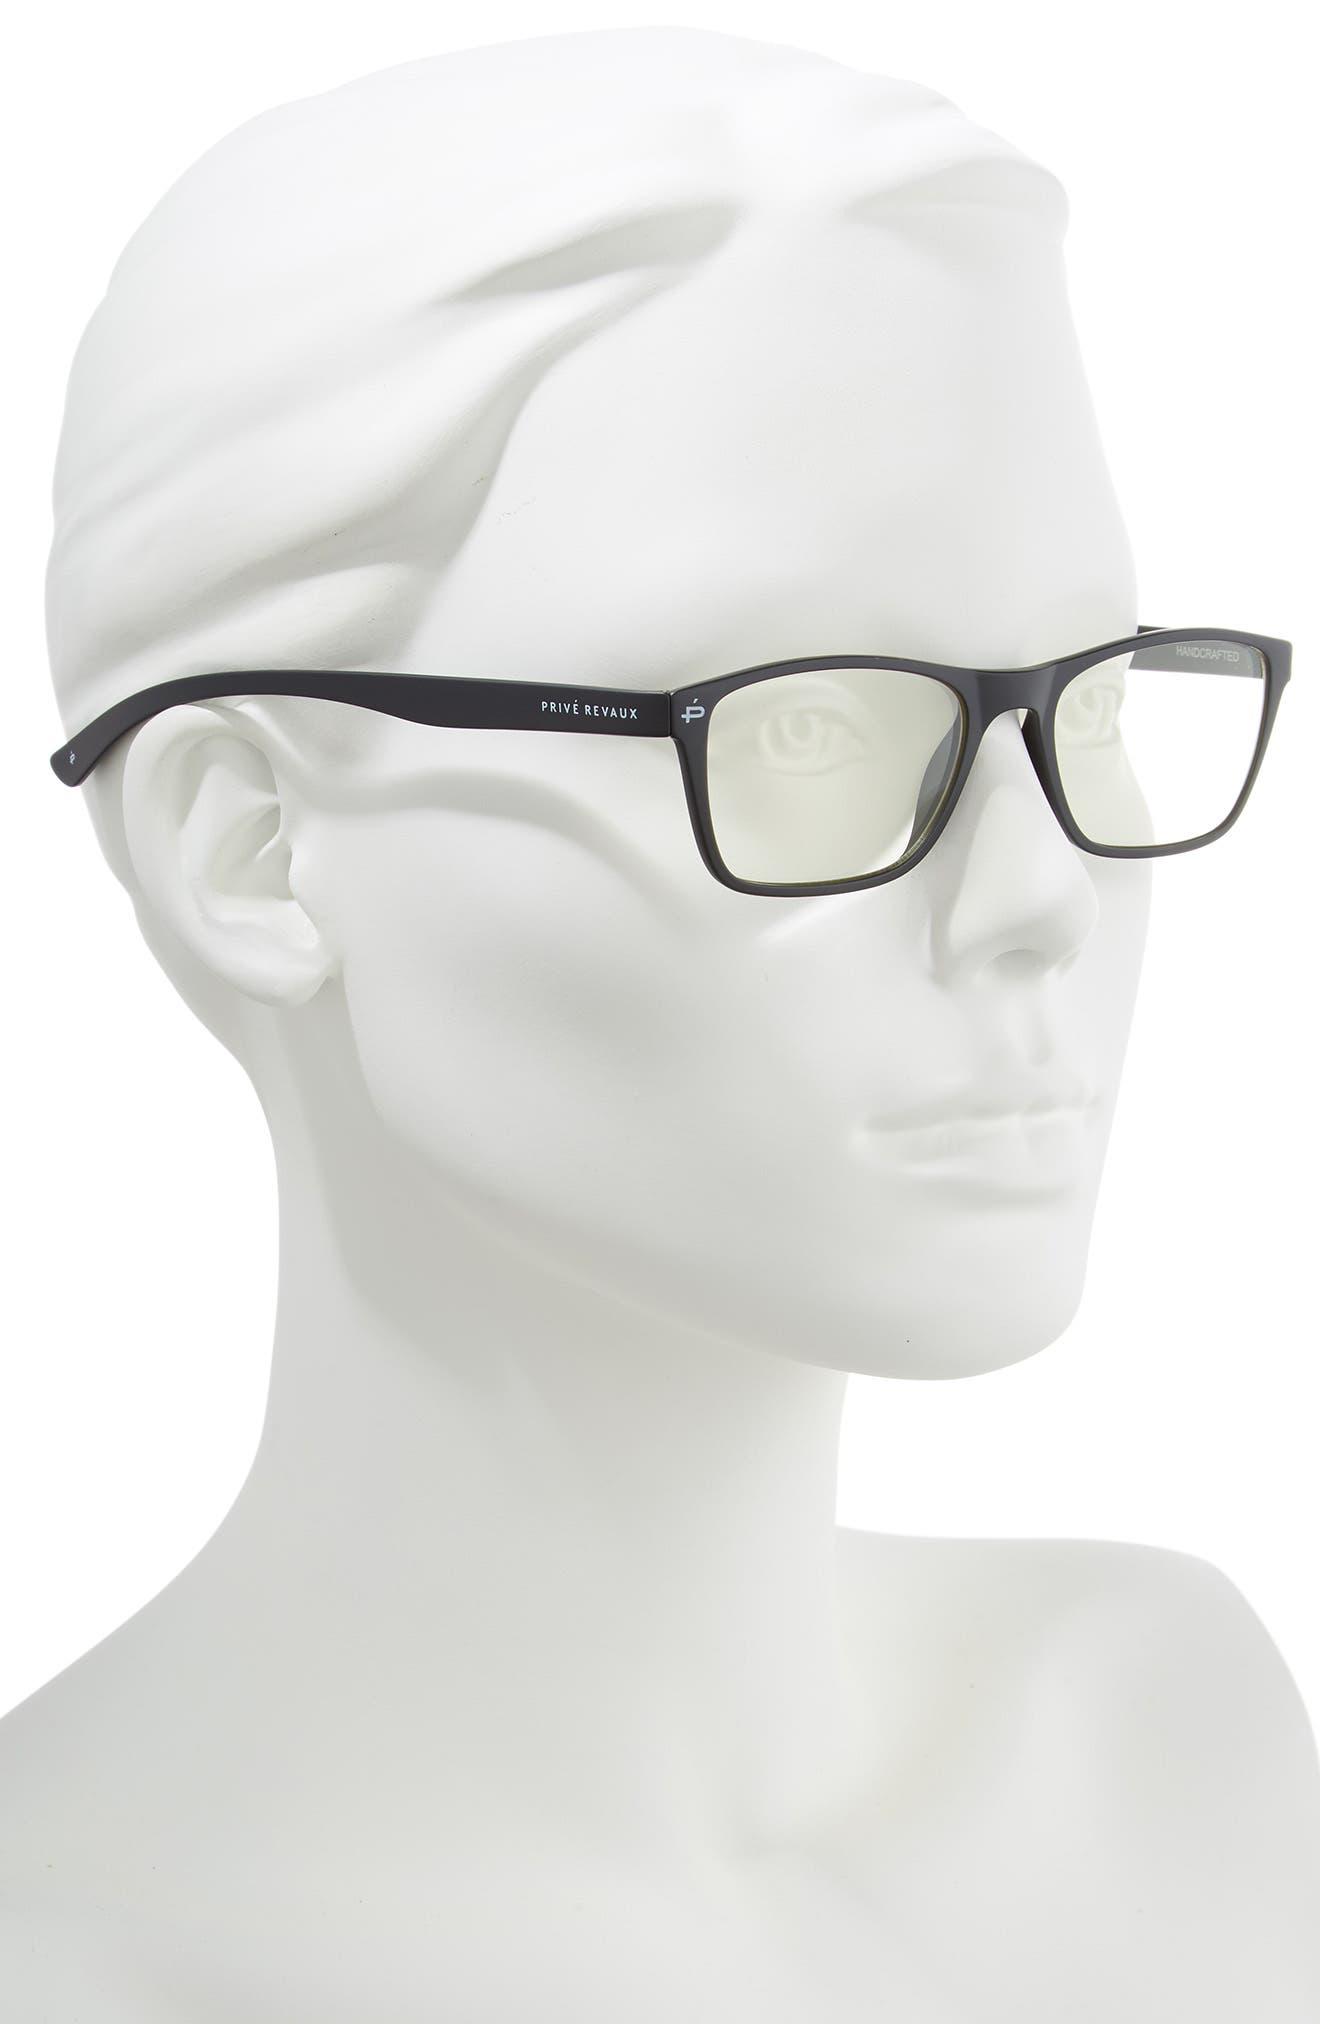 PRIVÉ REVAUX,                             The Socrates 51mm Blue Light Blocking Glasses,                             Alternate thumbnail 2, color,                             001